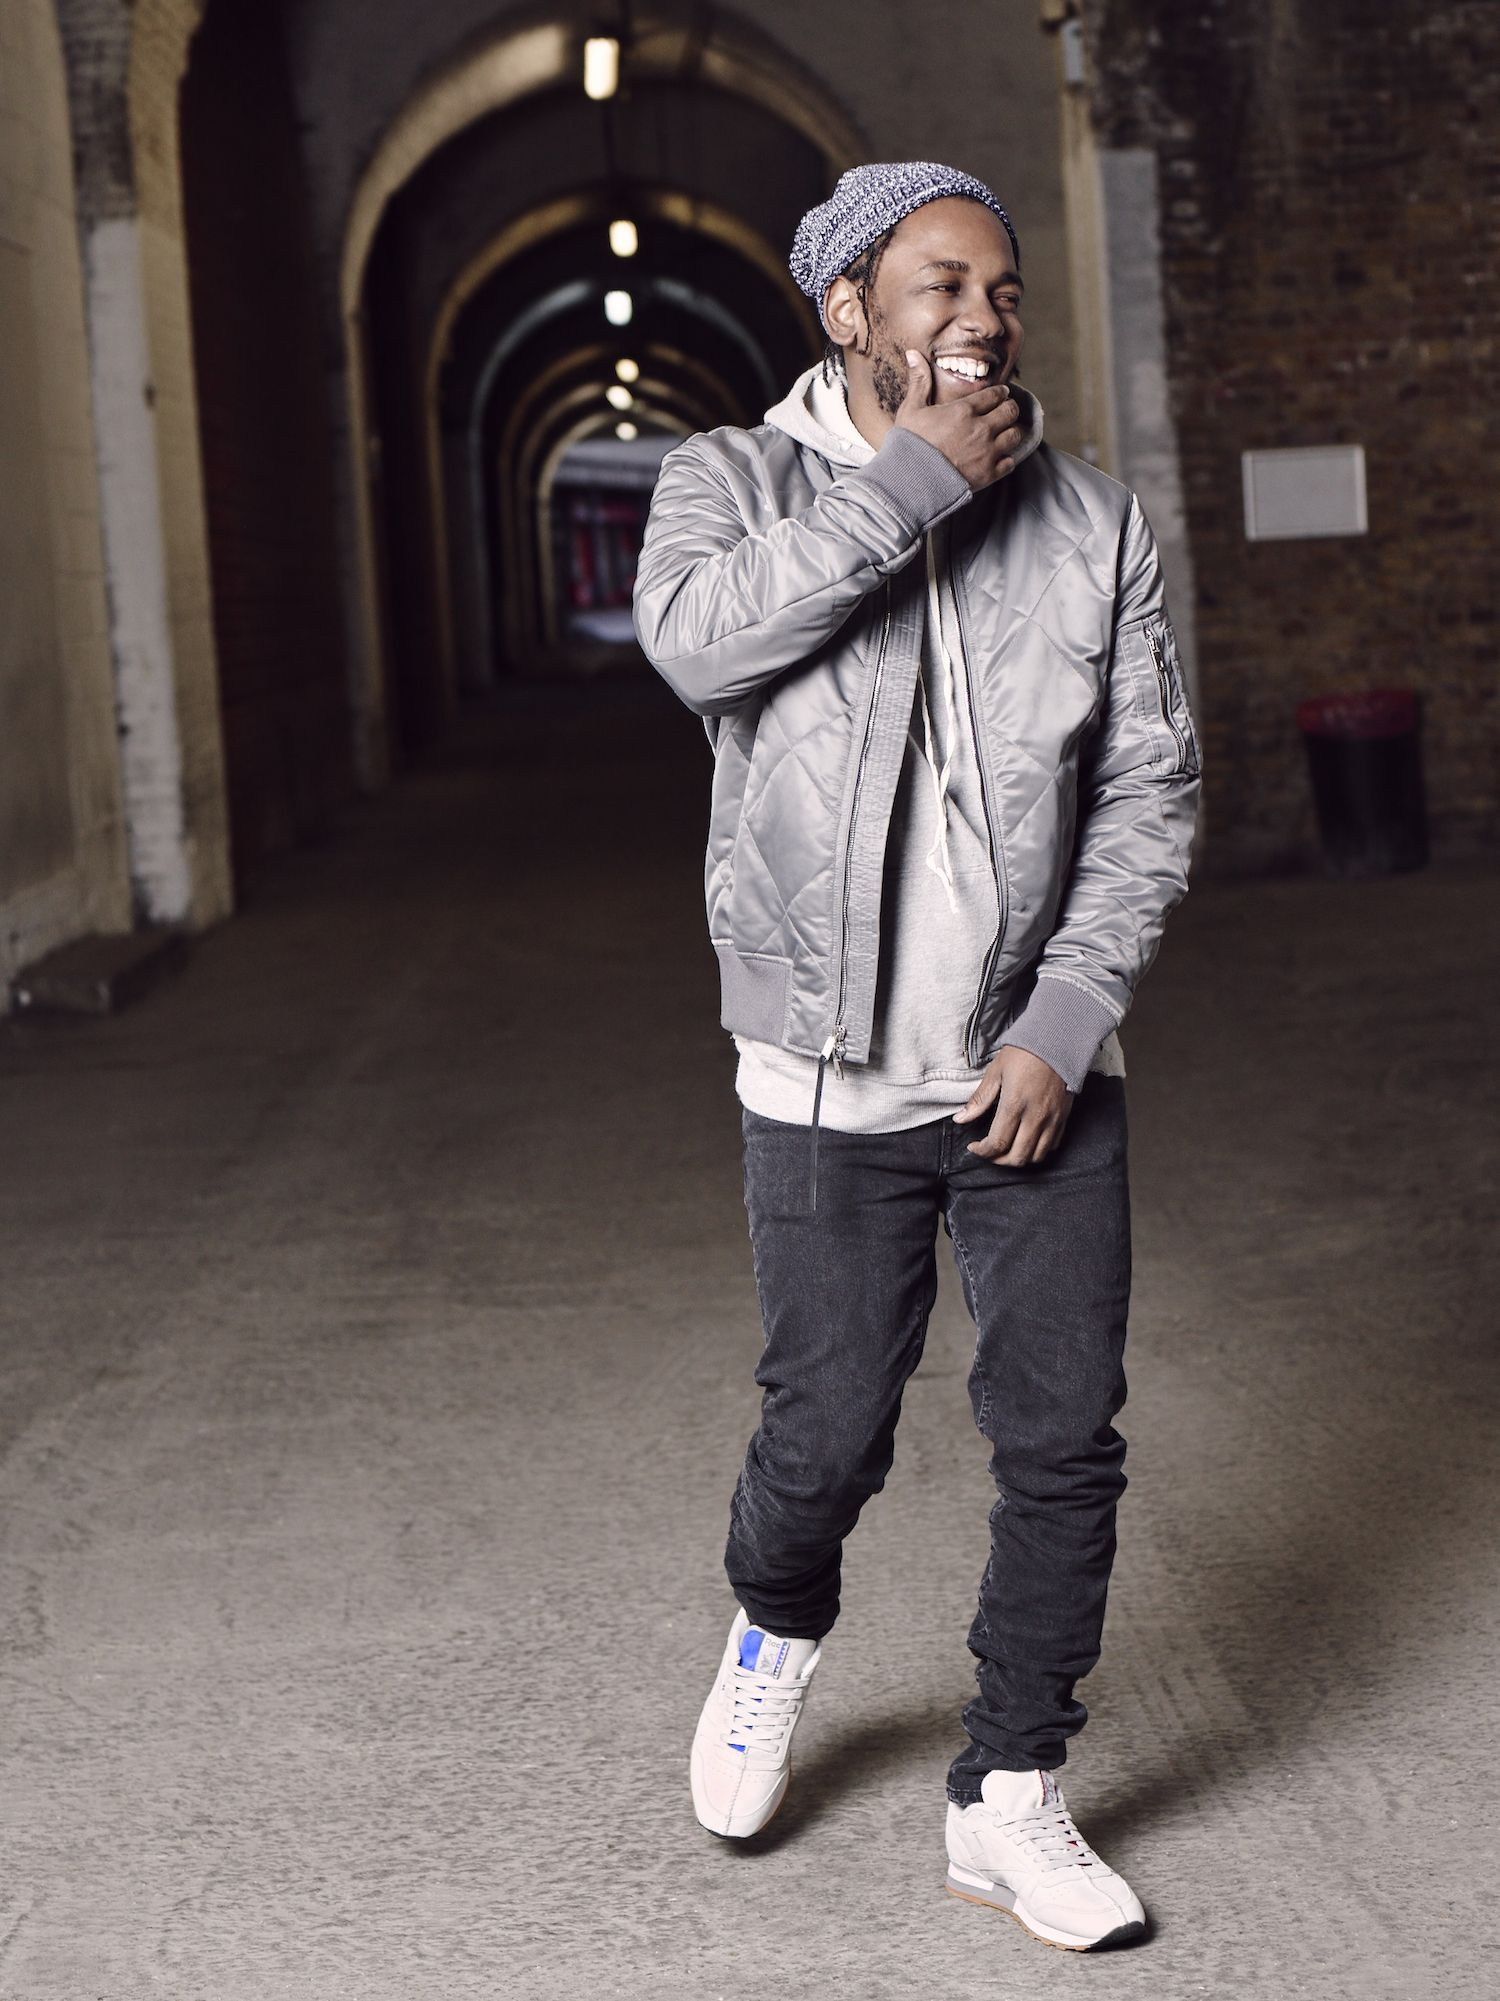 ... Releasing Kendrick Lamar x Reebok Classic Leather Deconstructed - EU  Kicks Sneaker Magazine ... c5bac1e2c